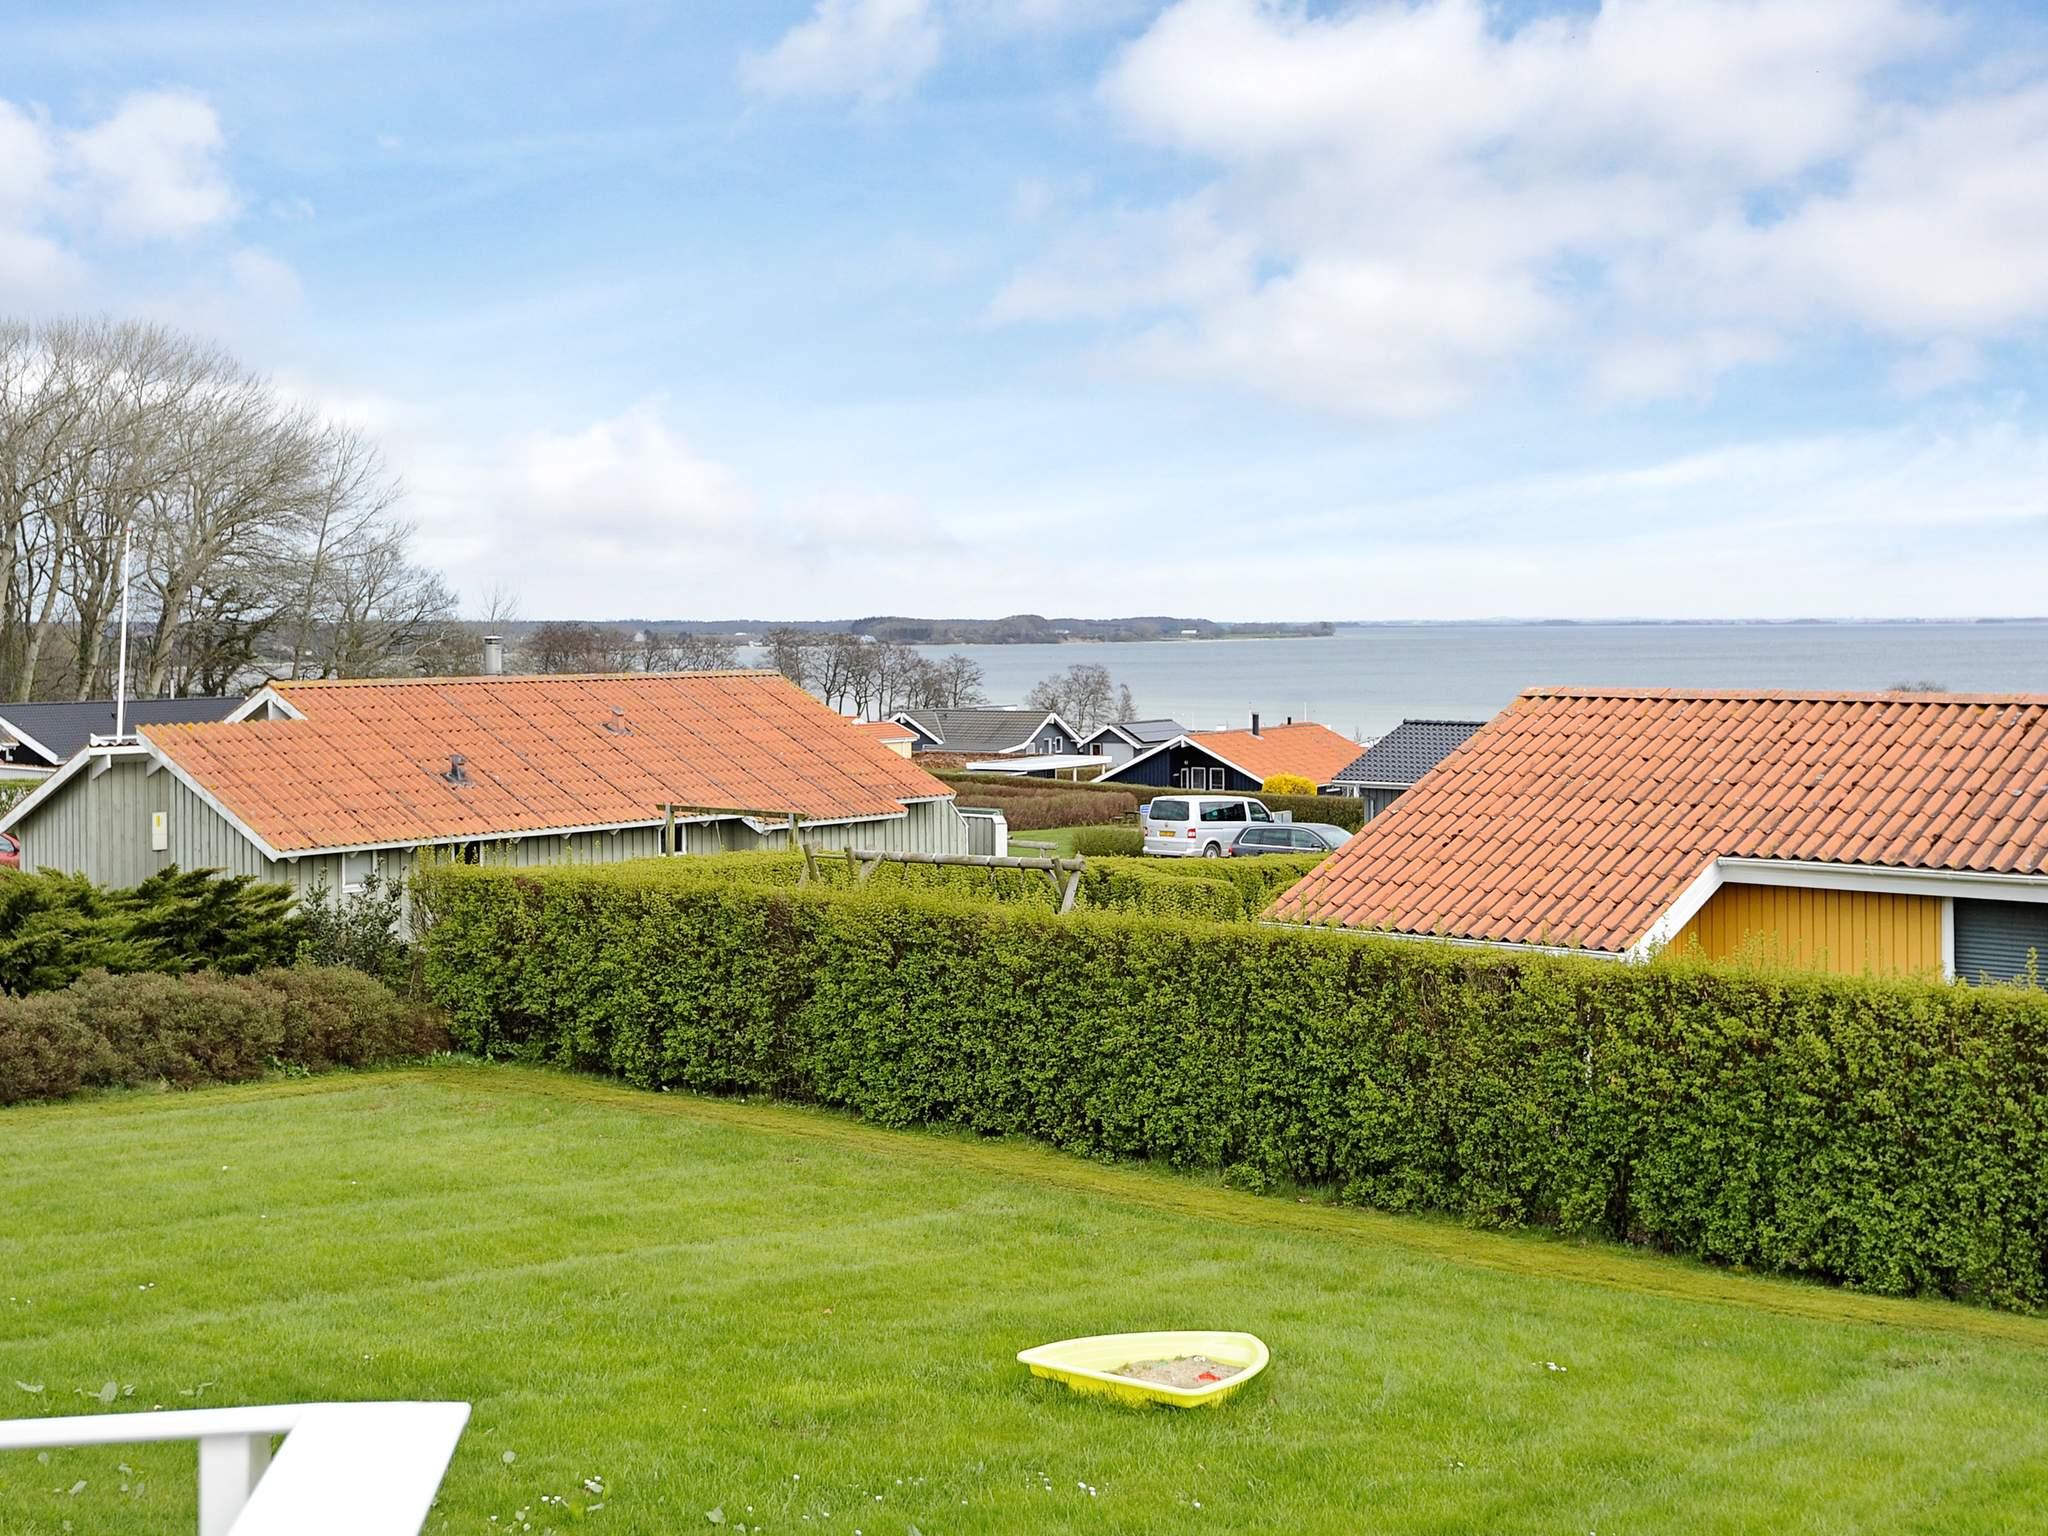 Ferienhaus Grønninghoved Strand (241760), Grønninghoved, , Südostjütland, Dänemark, Bild 15